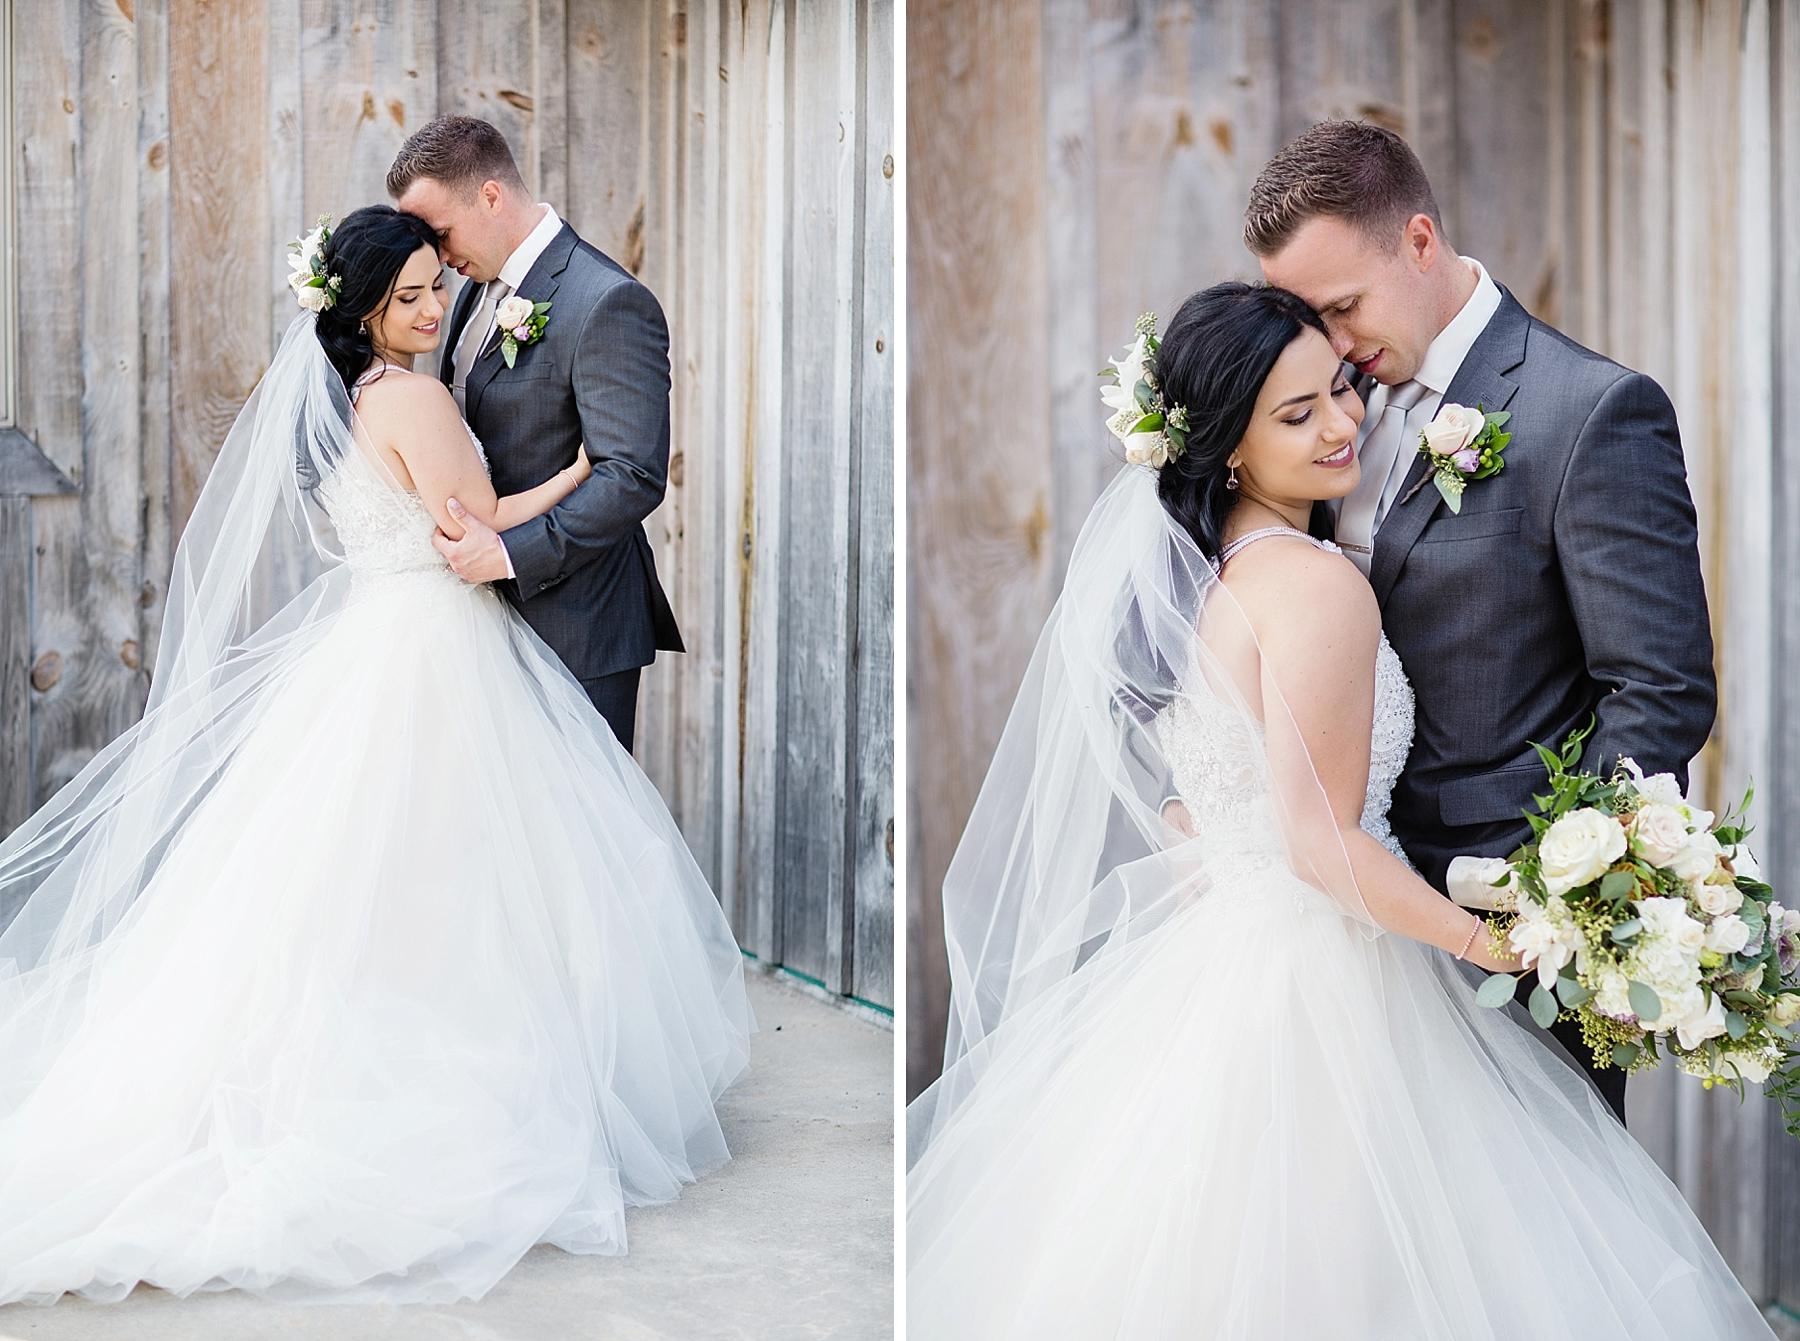 windsor-wedding-photographer-sprucewood-shores-winery-wedding-niagara-on-the-lake-wedding-photographer-eryn-shea-photography_0039.jpg